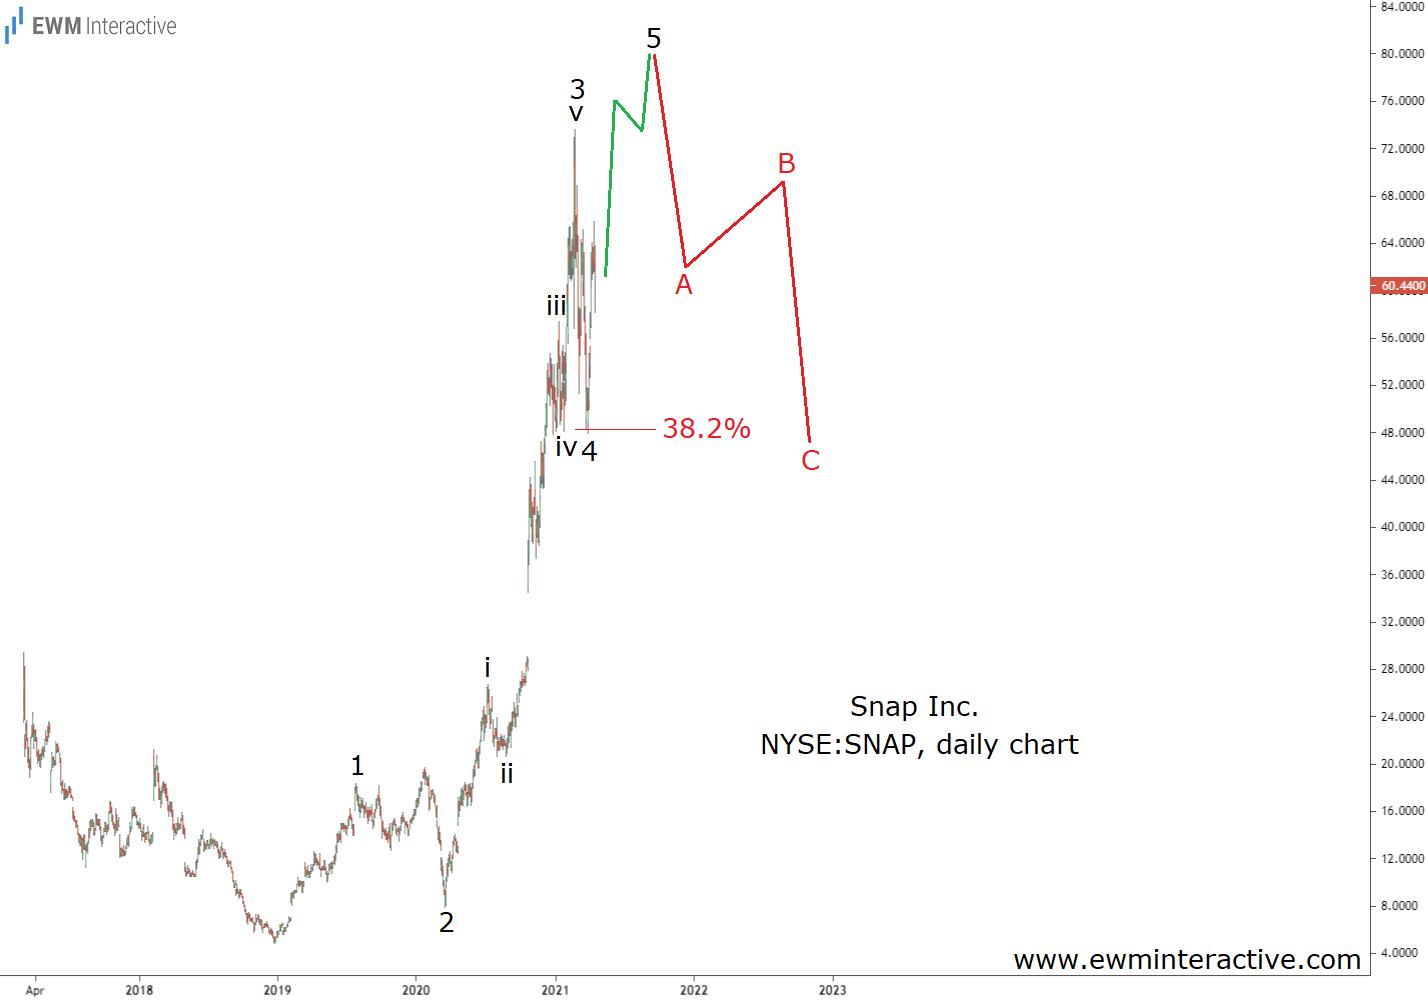 Snap Stock to form a bearish Elliott Wave reversal near $80